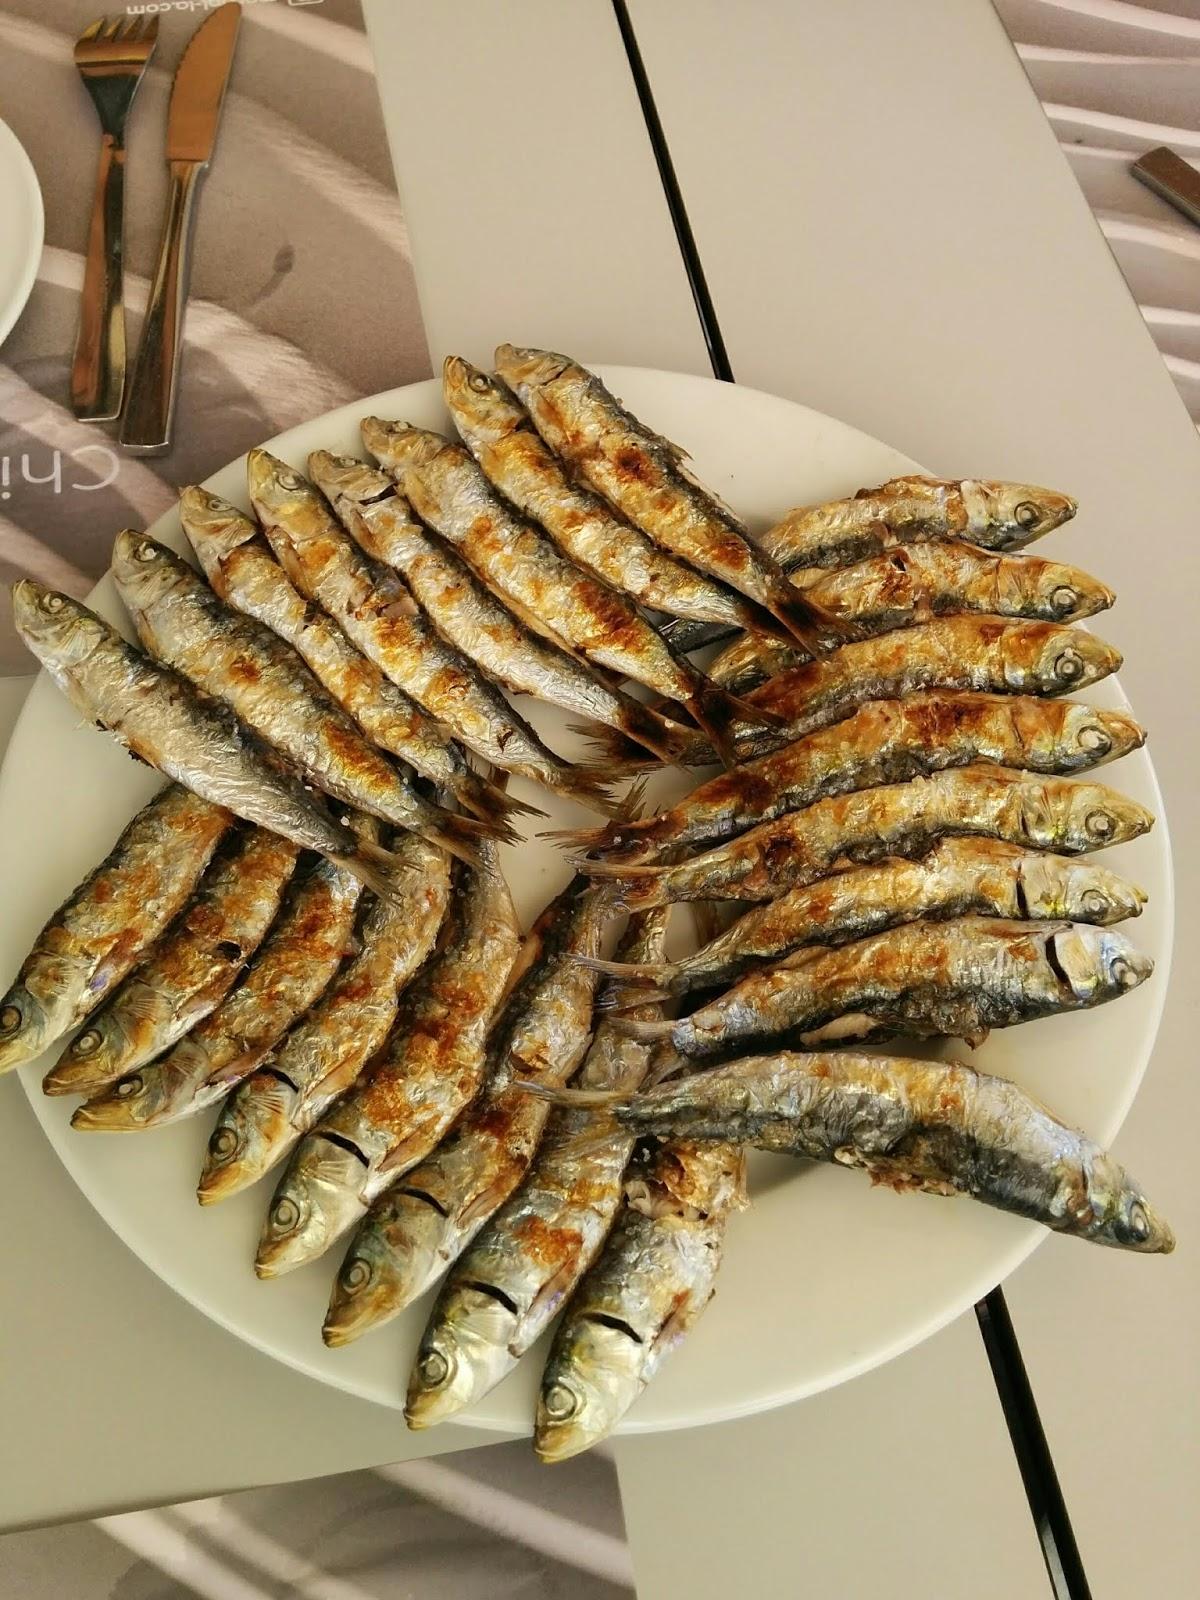 sardines espetos malaga spain